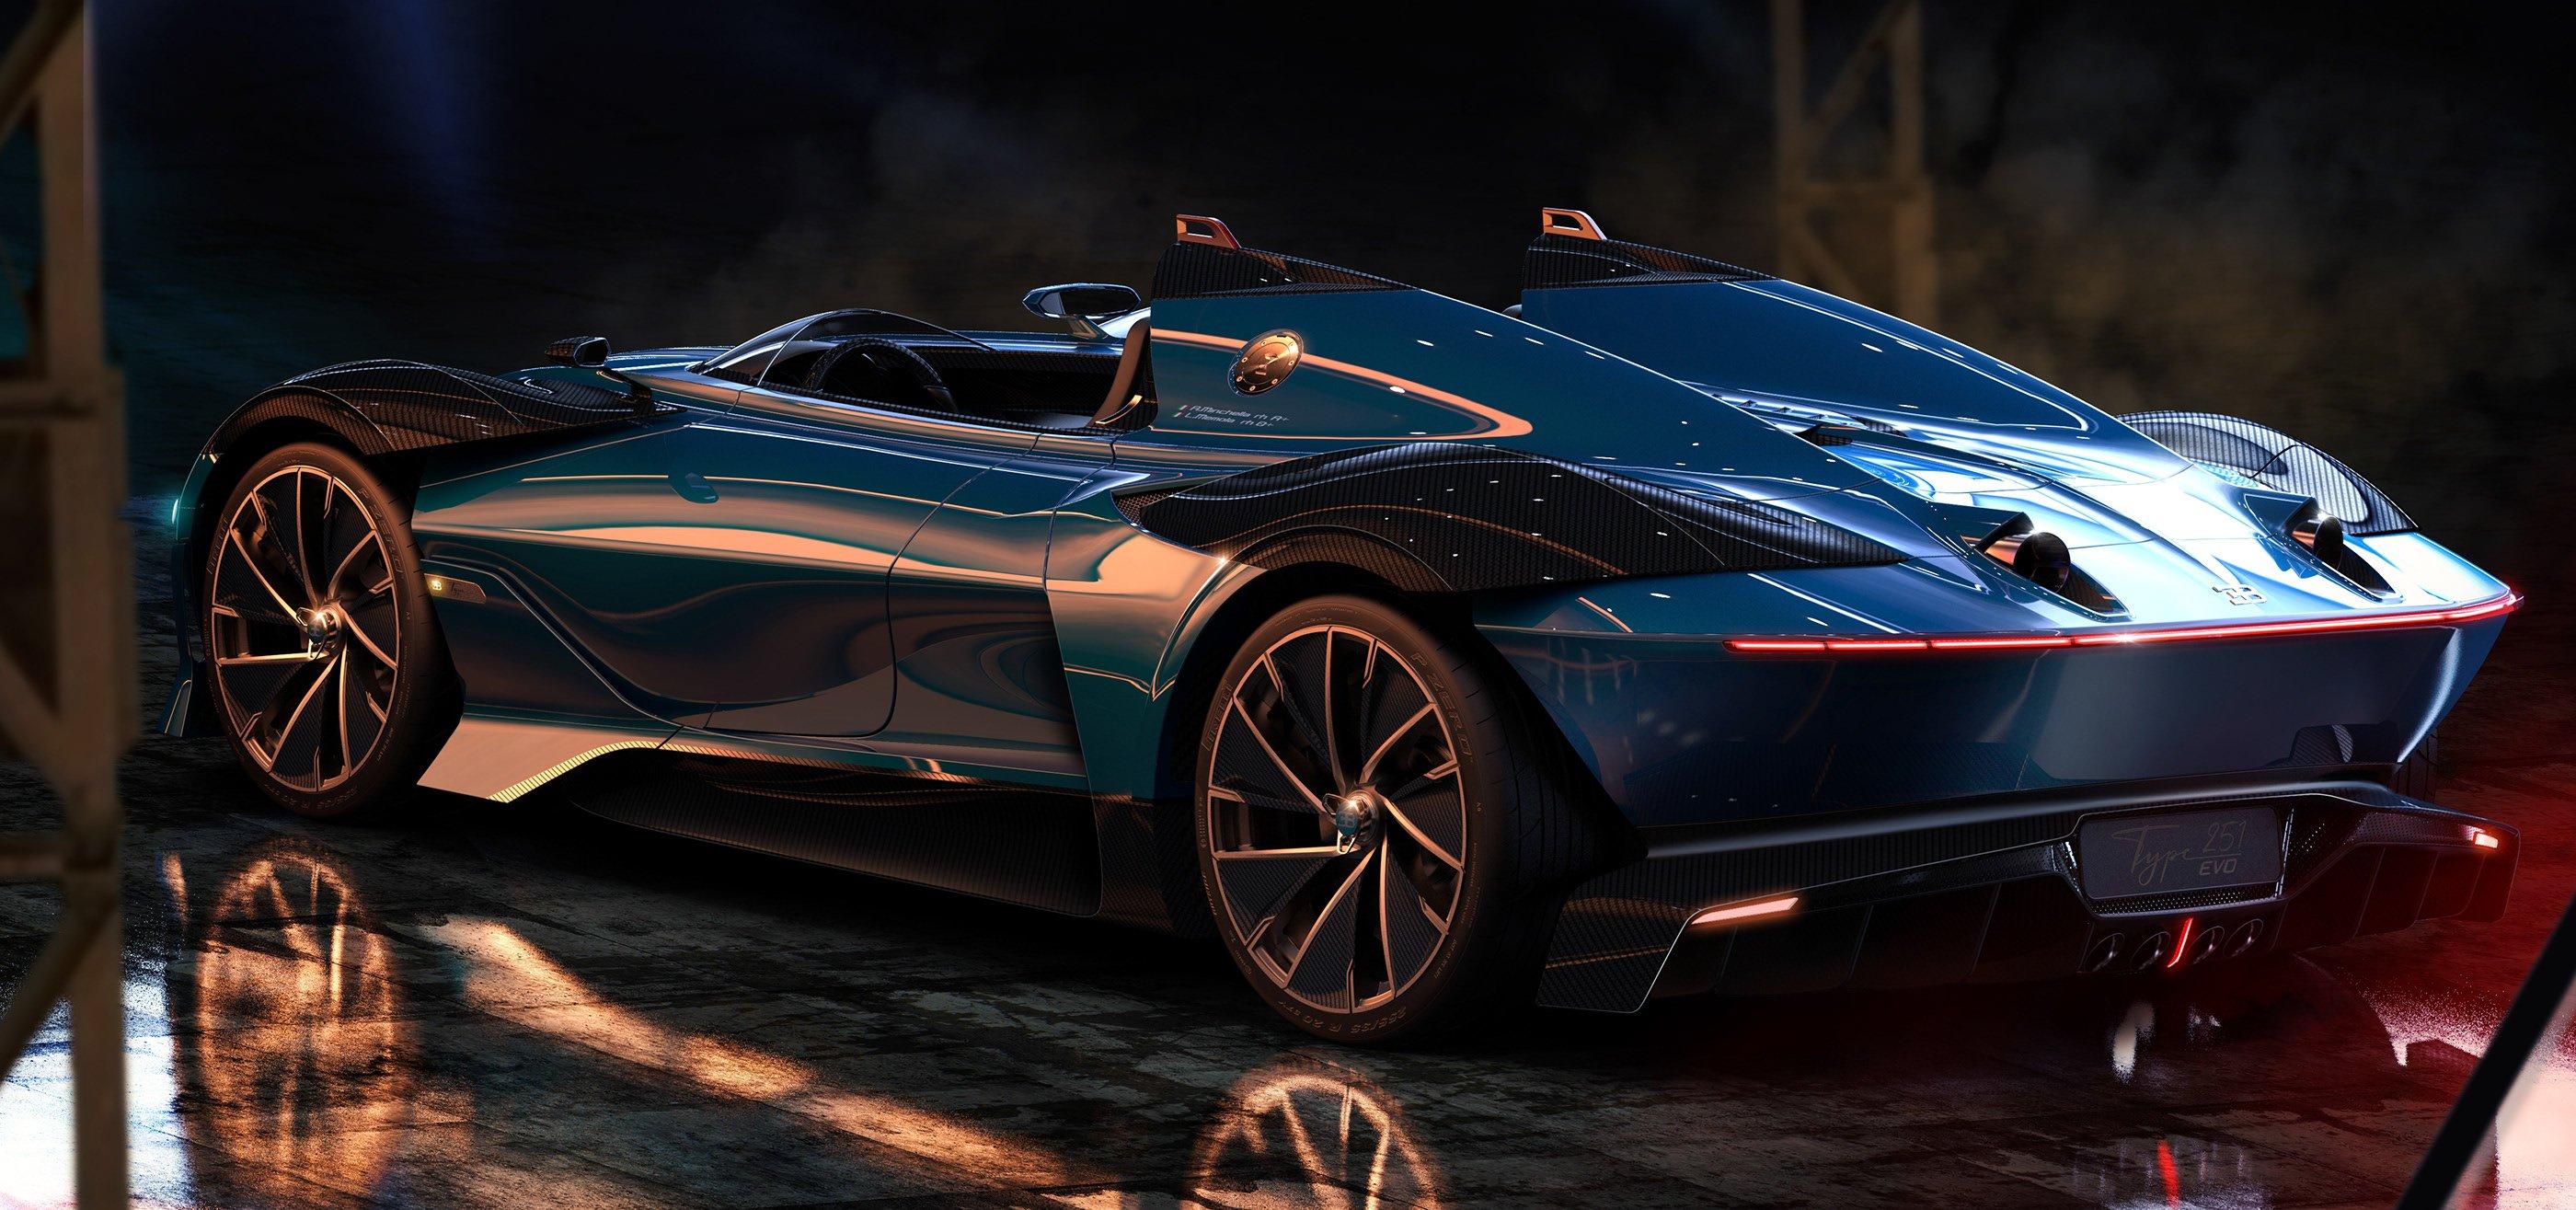 luigi-memola-alessio-minchella-2020-bugatti-251-EVO-keyshot-05